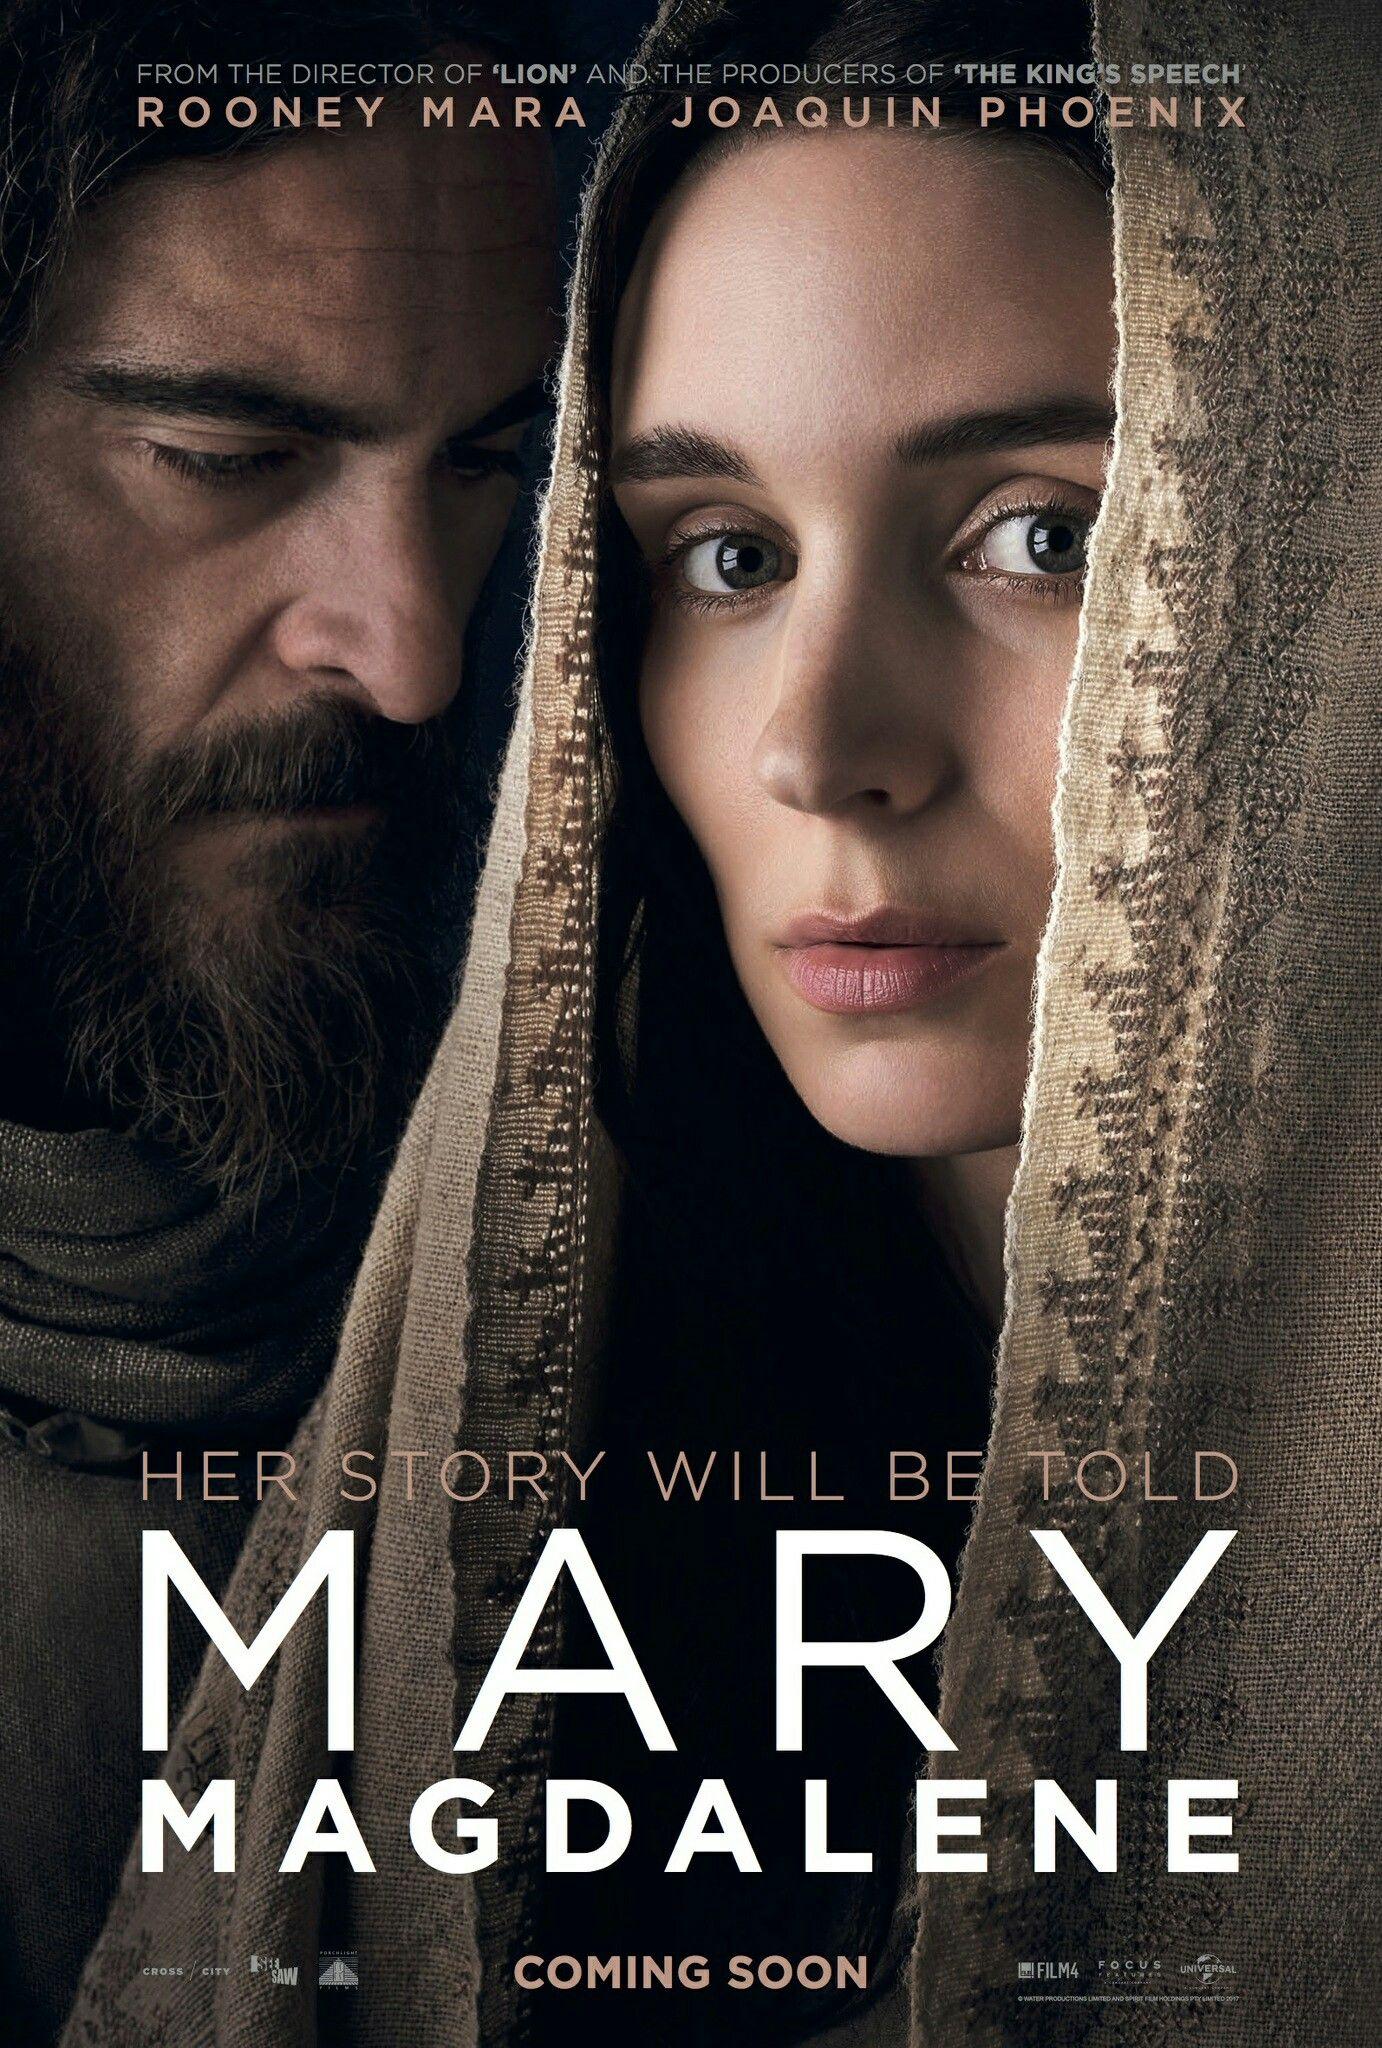 Download Mary Magdalene 2018 Hindi Dual Audio 1080p BluRay ESubs 2GB